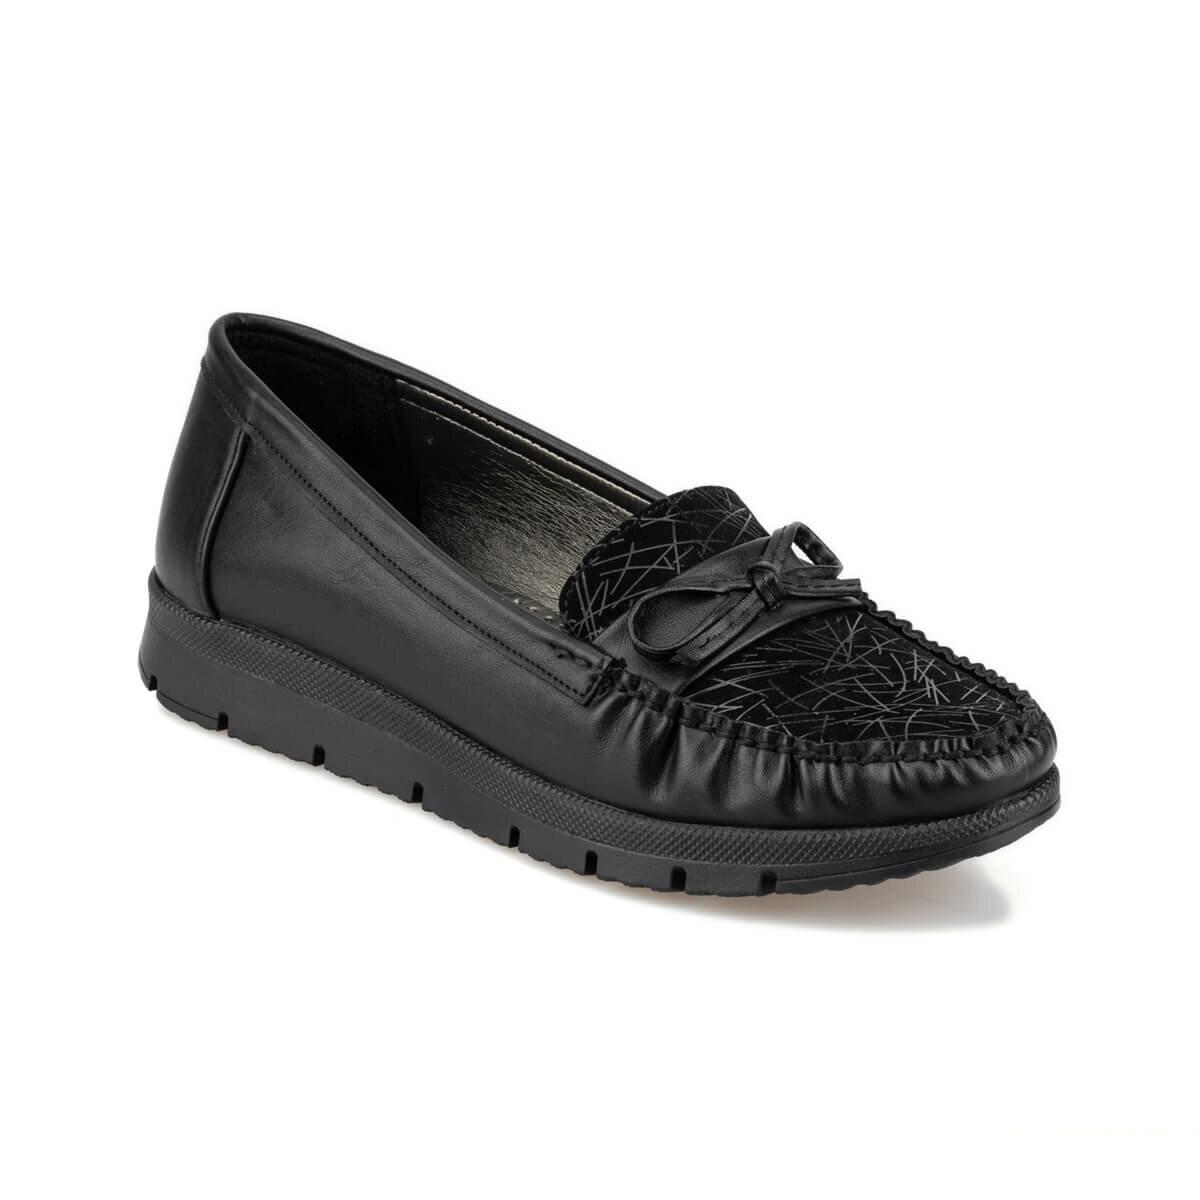 FLO 92.151012.Z Black Women Loafer Shoes Polaris